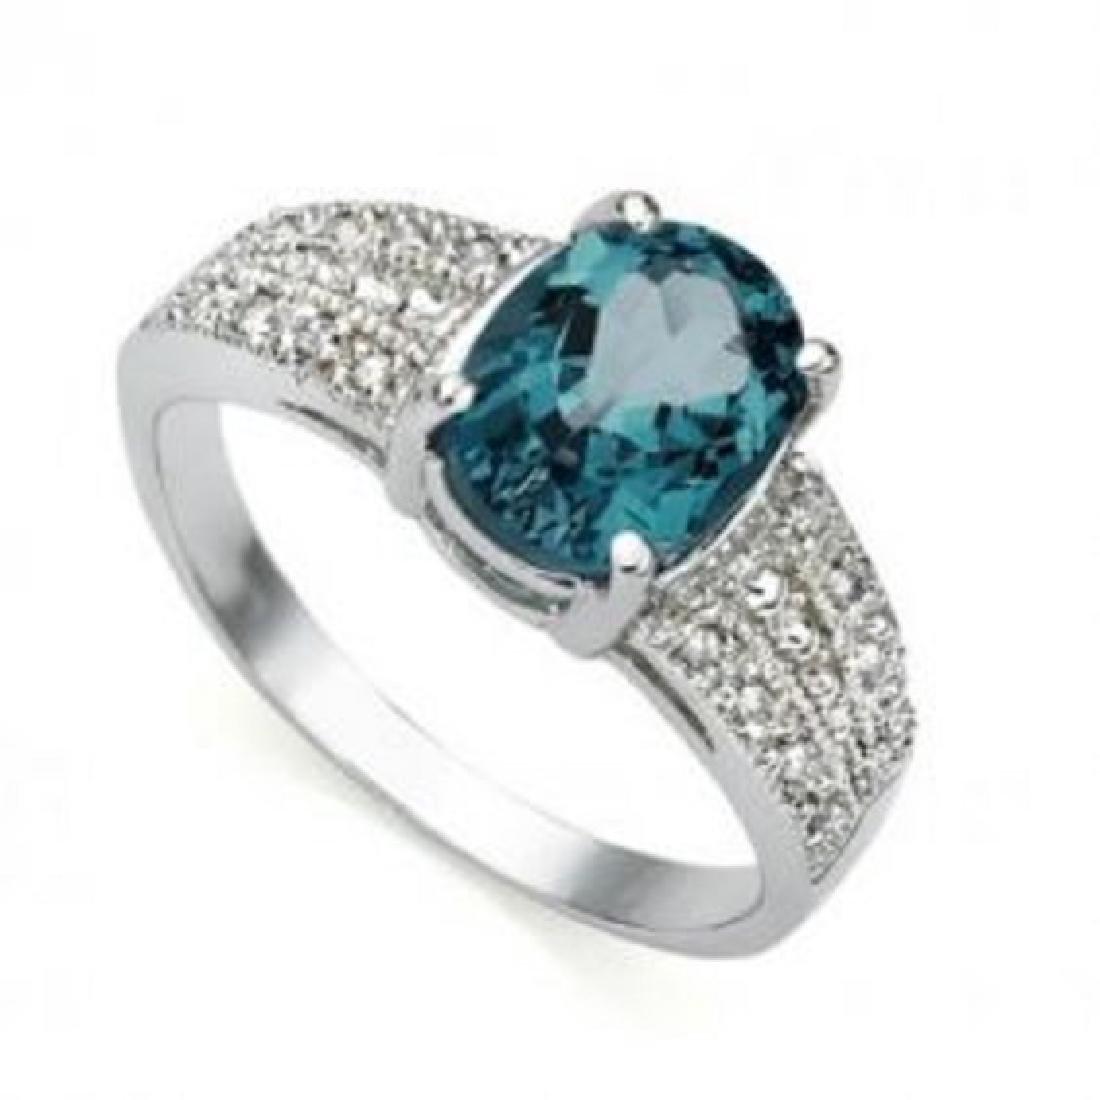 1.41 CT Certified Topaz & Diamond 14Kw Ring $4,170.00 - 2